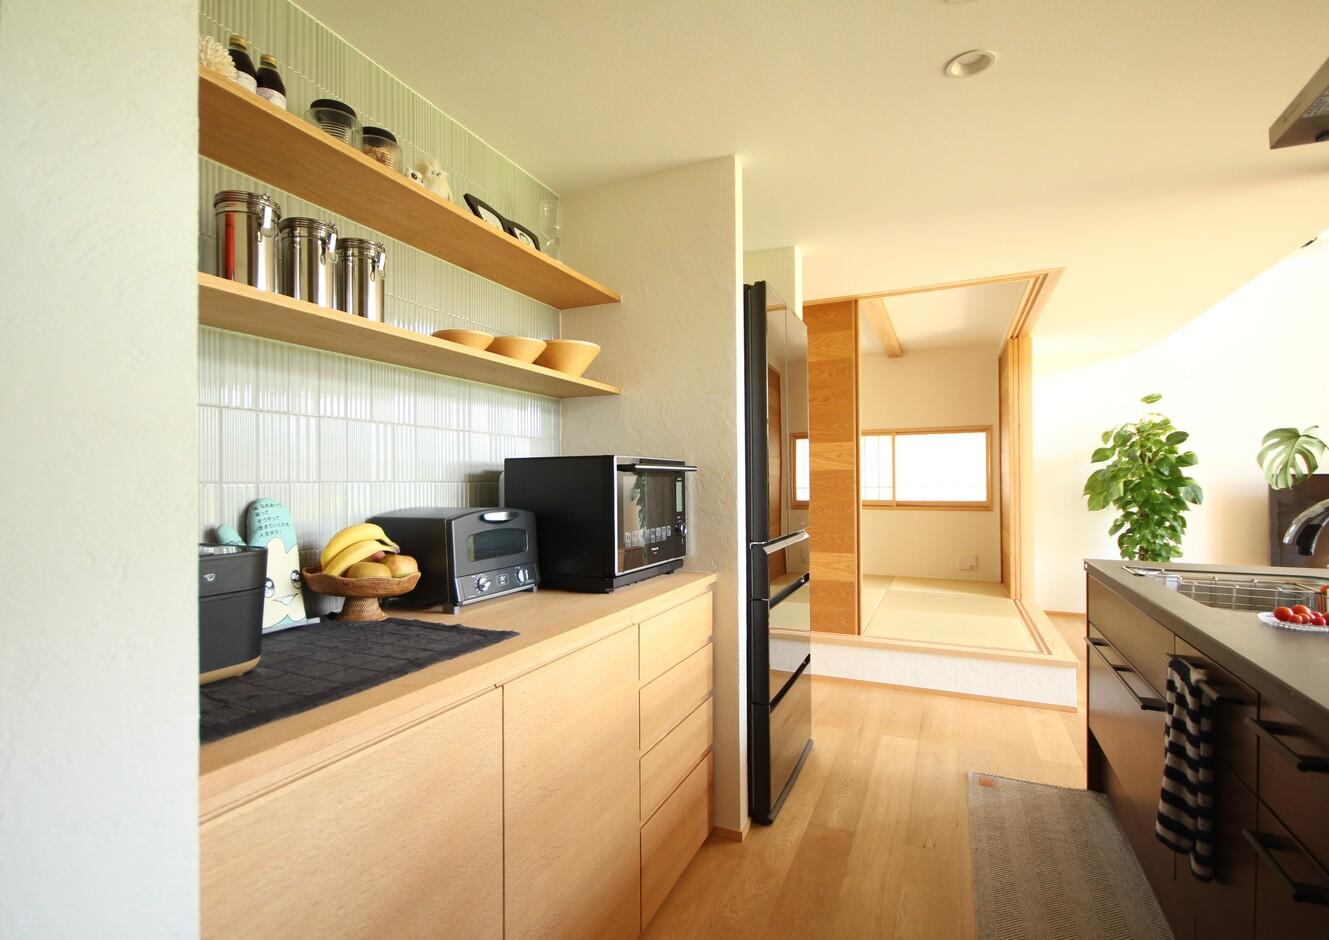 KESHIKI YAMANASHI【収納力、間取り、ガレージ】広々としたキッチン。キャビネットと棚を造作し、収納力も抜群